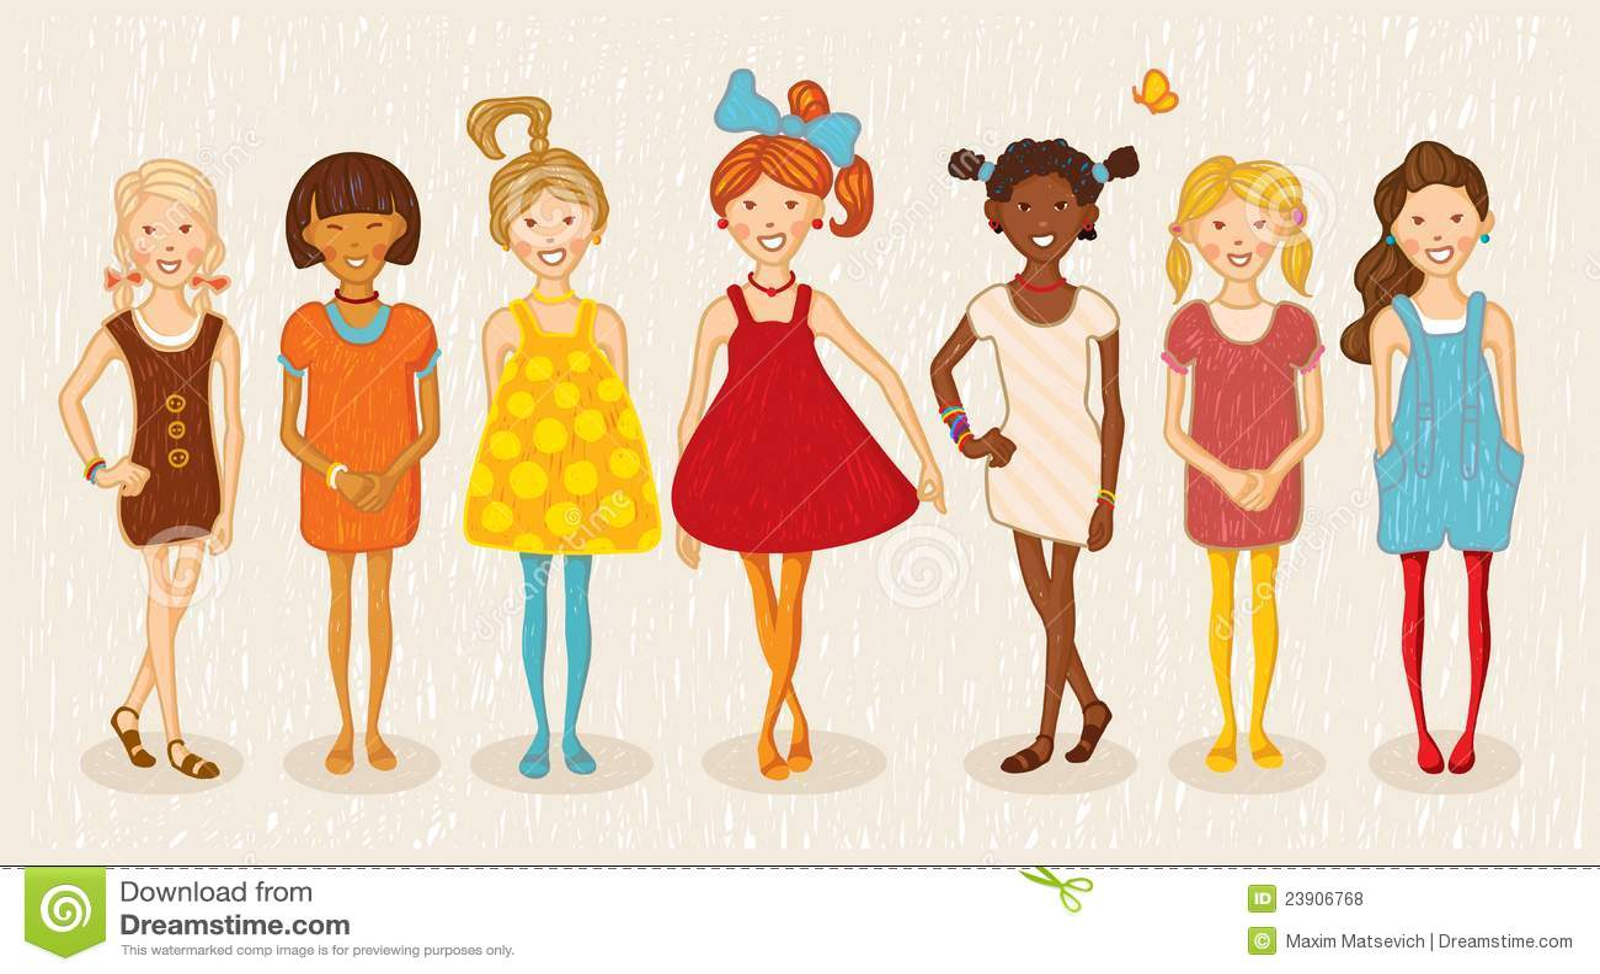 Seven Girls Illustration Set Royalty Free Stock Photos